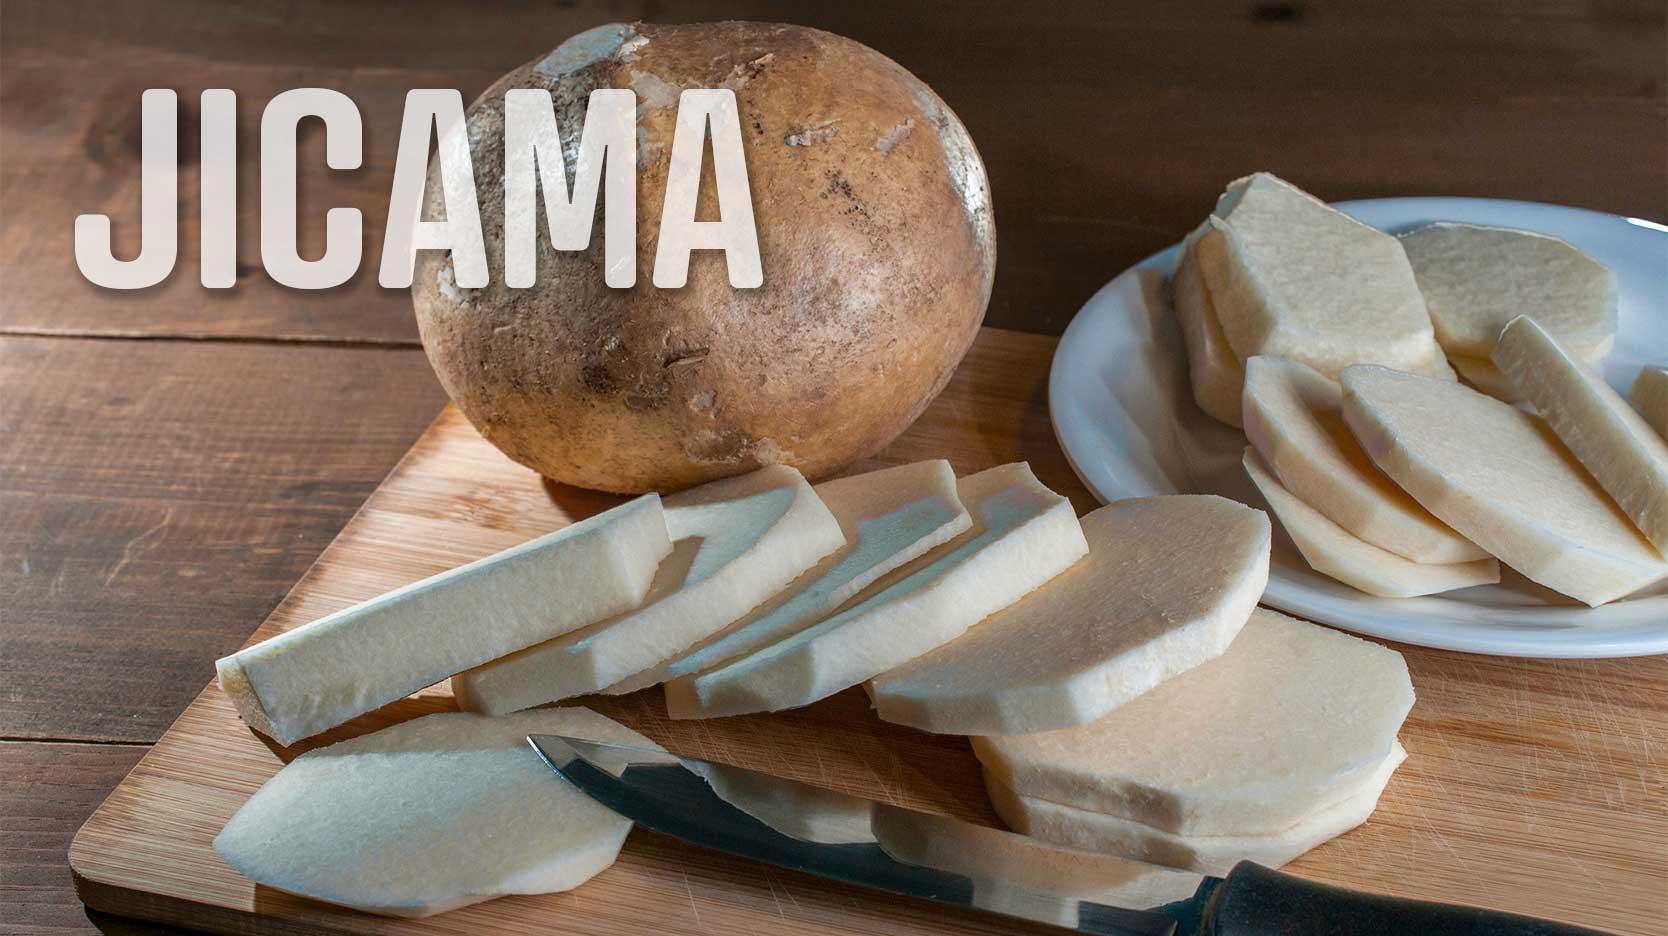 foods that start with j jicama